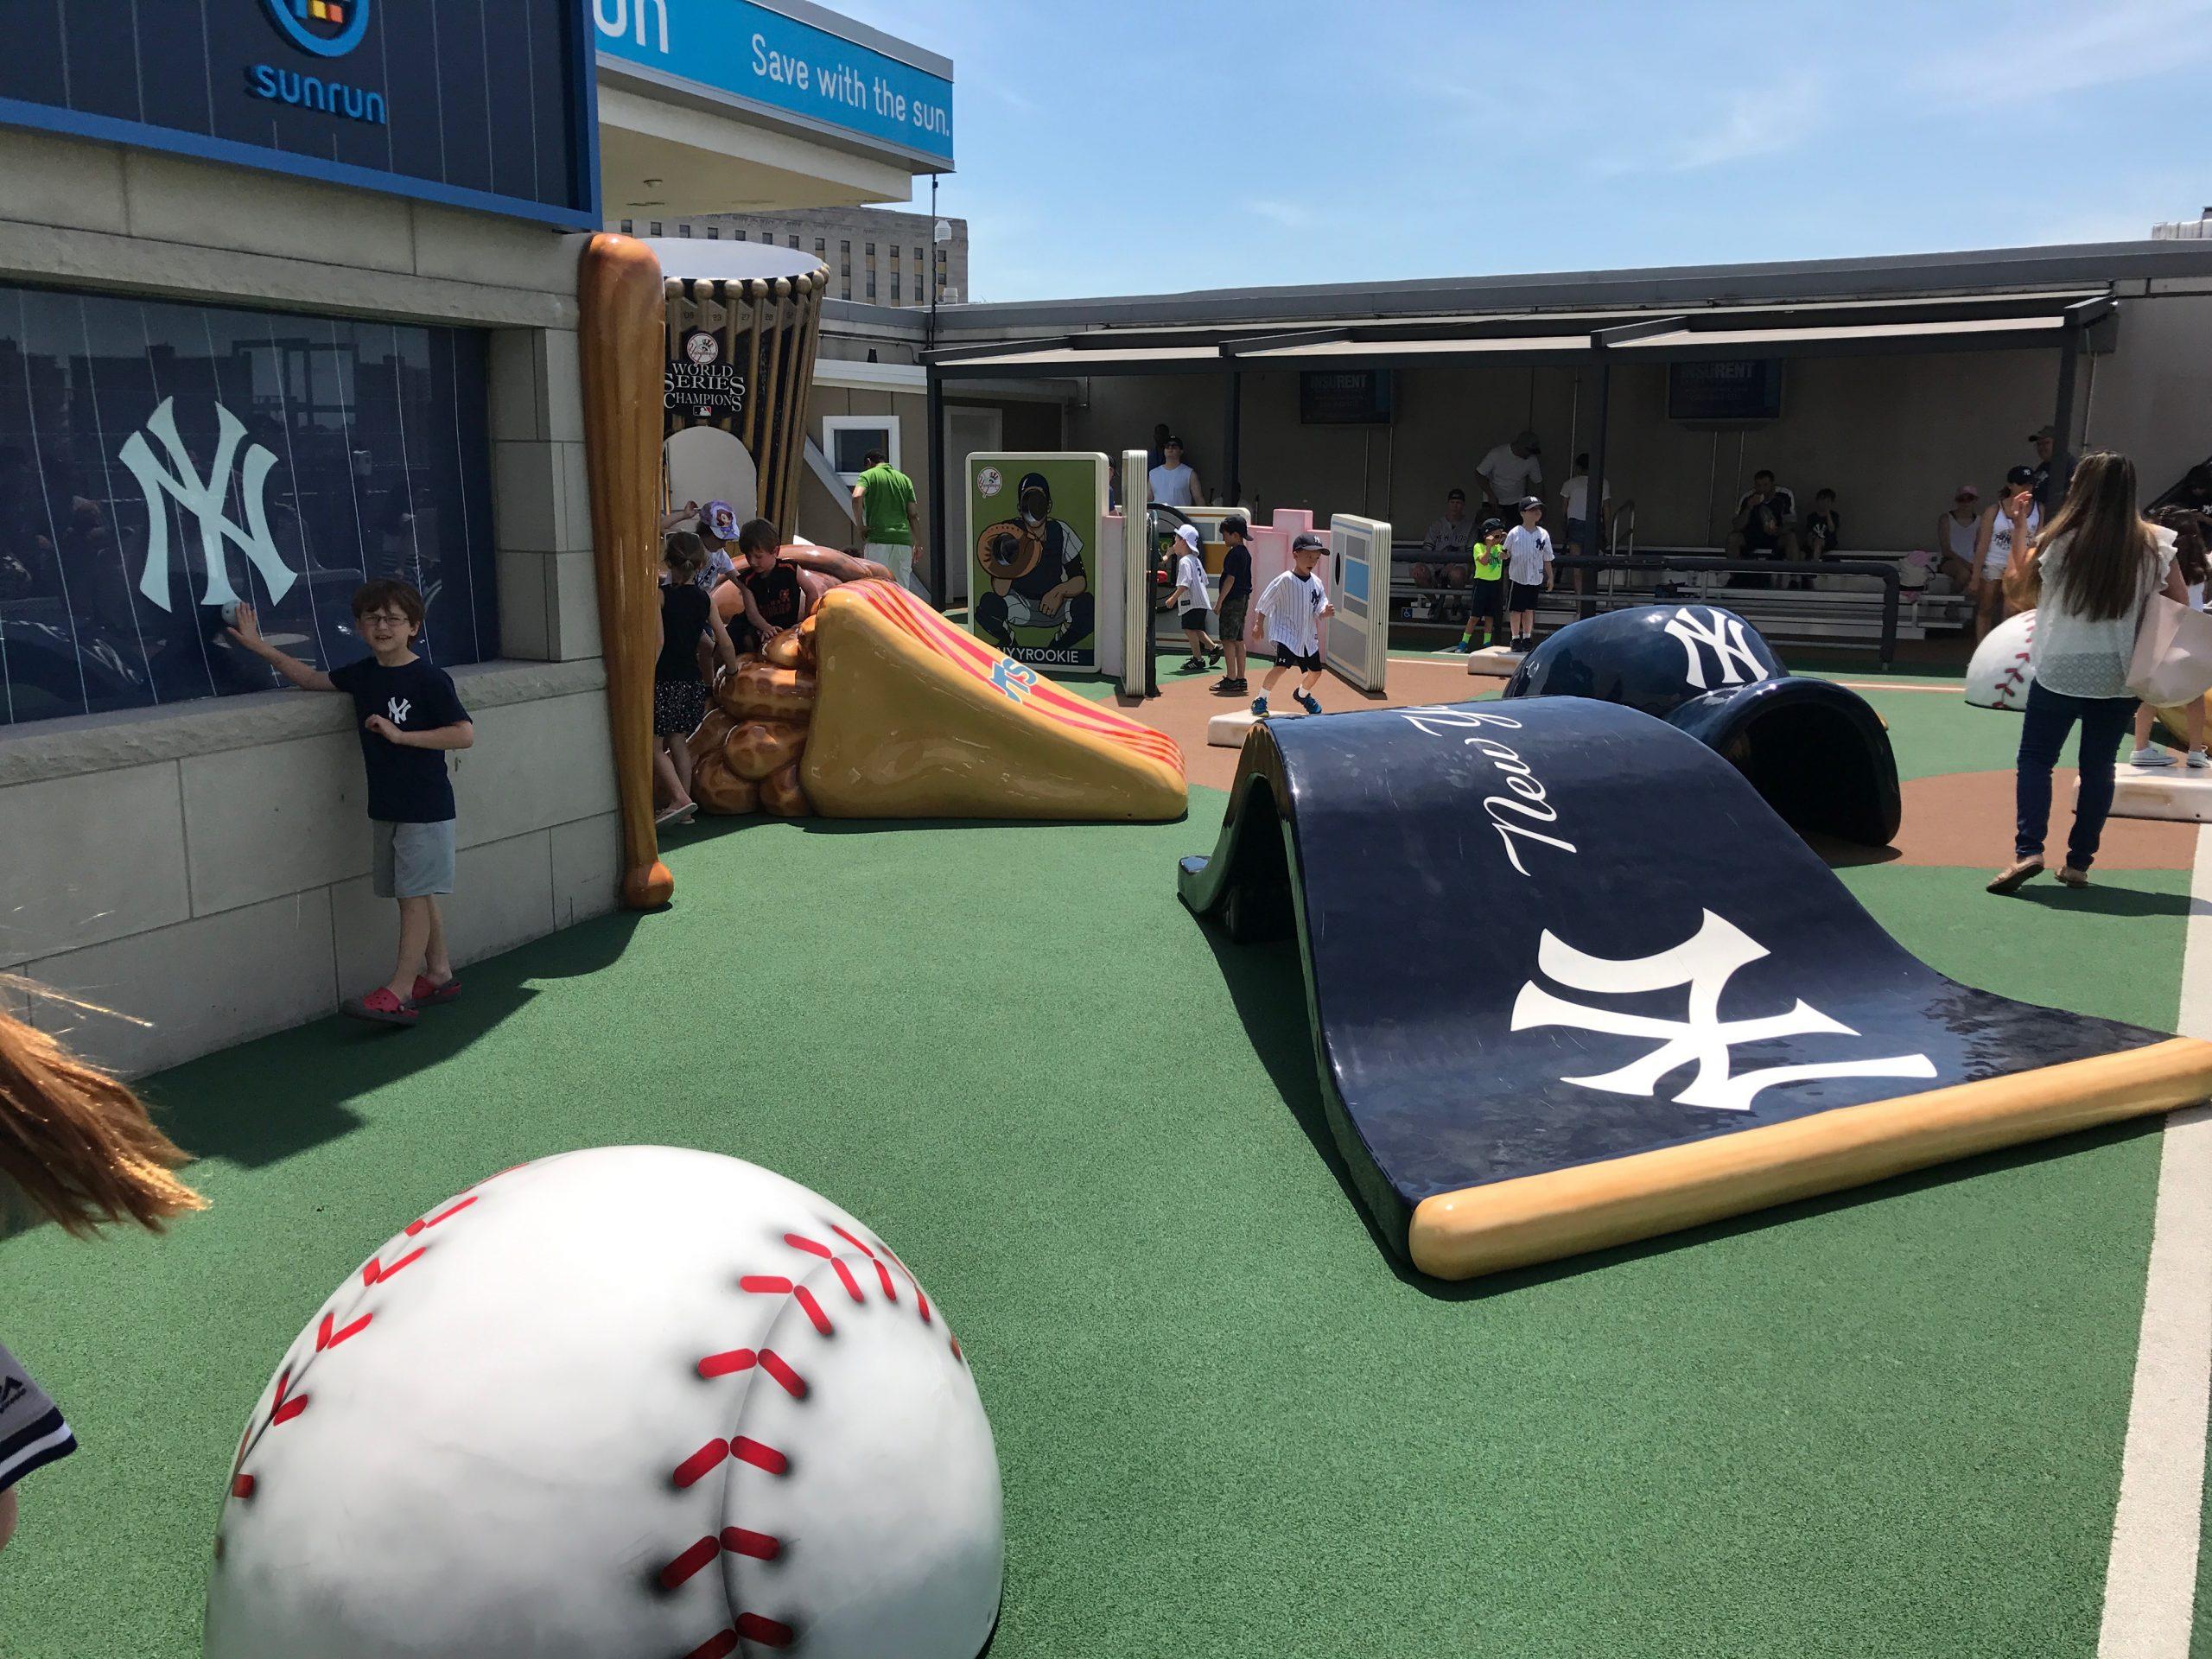 Baseball branded sculptures